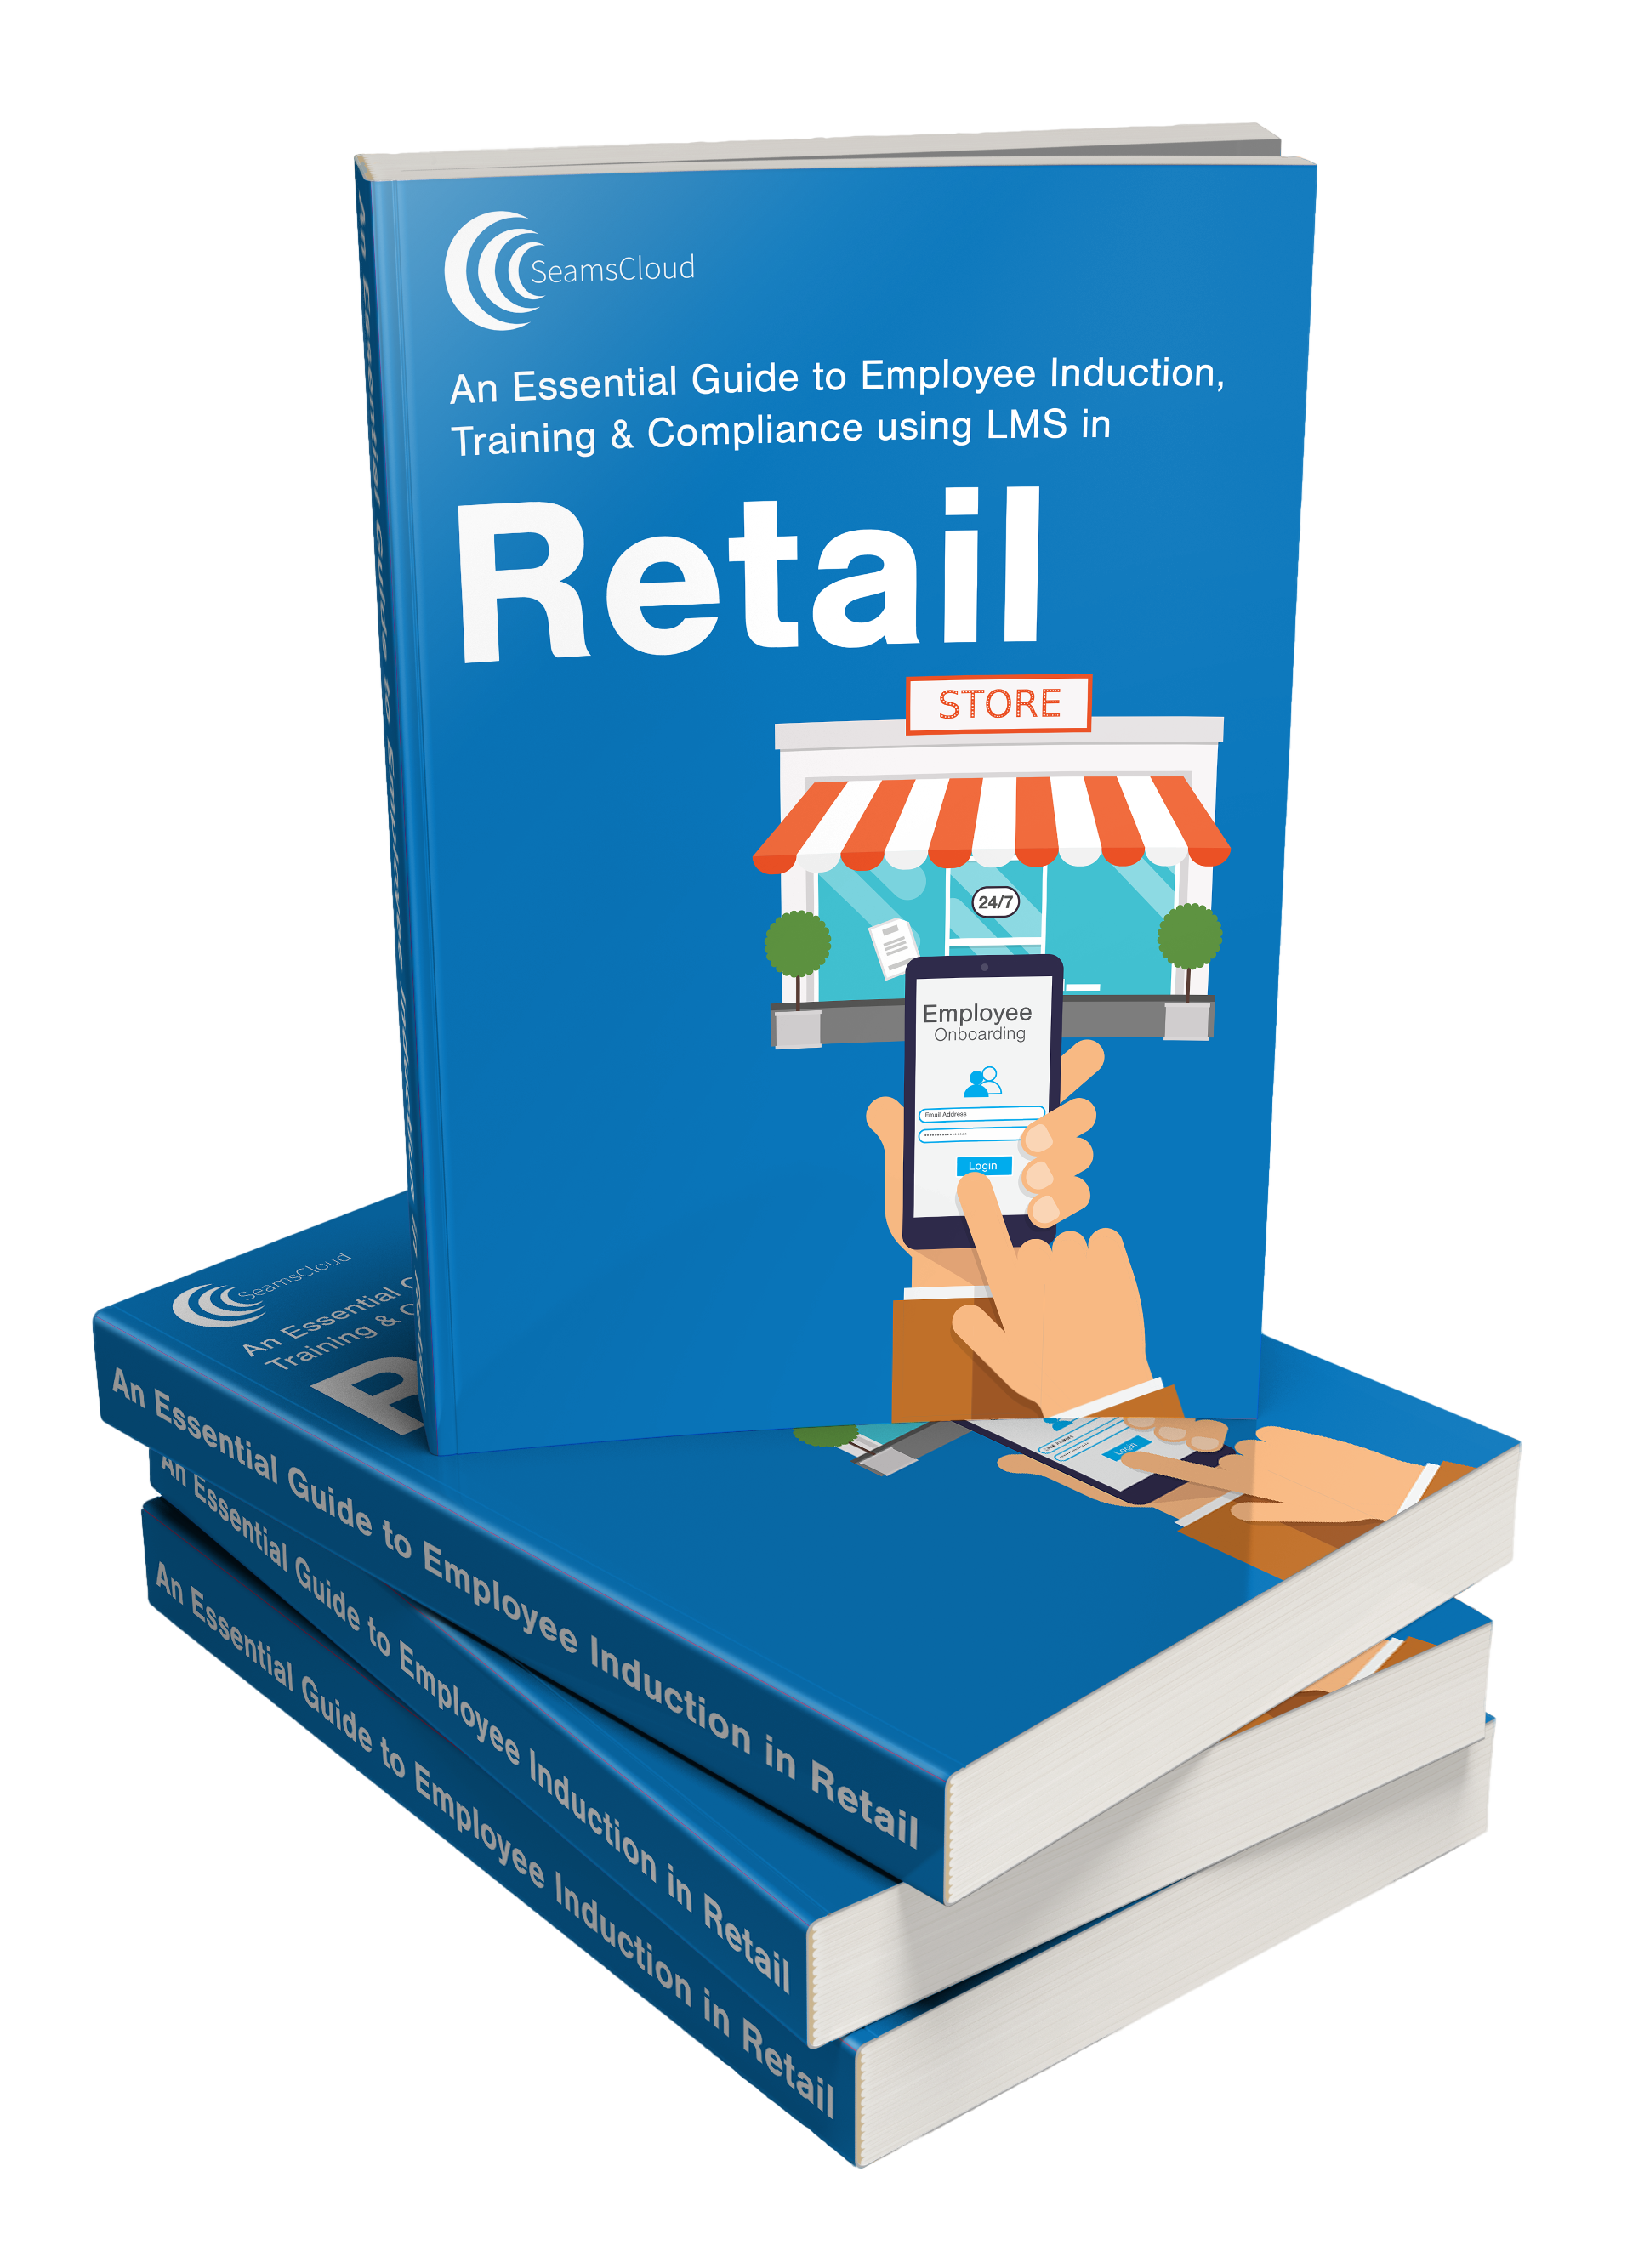 Retail eBook Stack Image